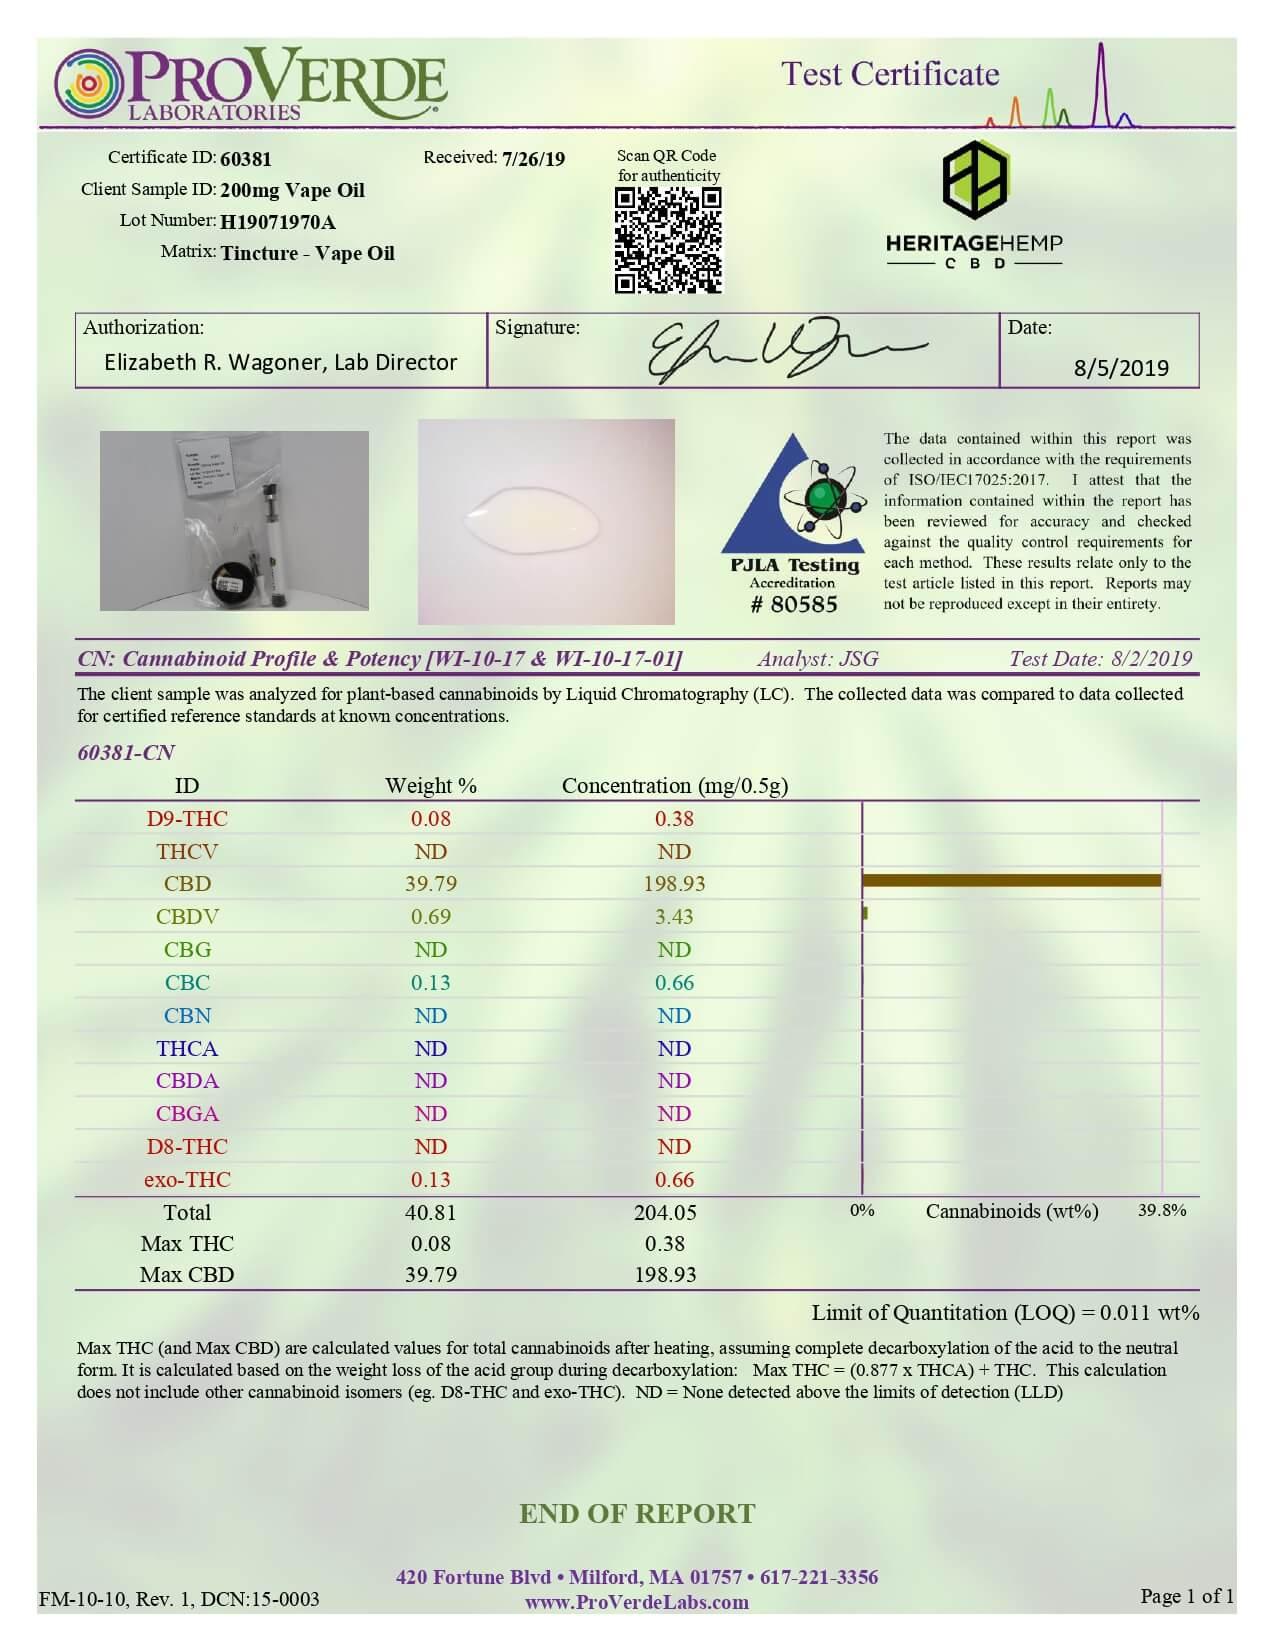 Heritage Hemp CBD Vape Device Disposable Hemp Extract Oil Lab Report